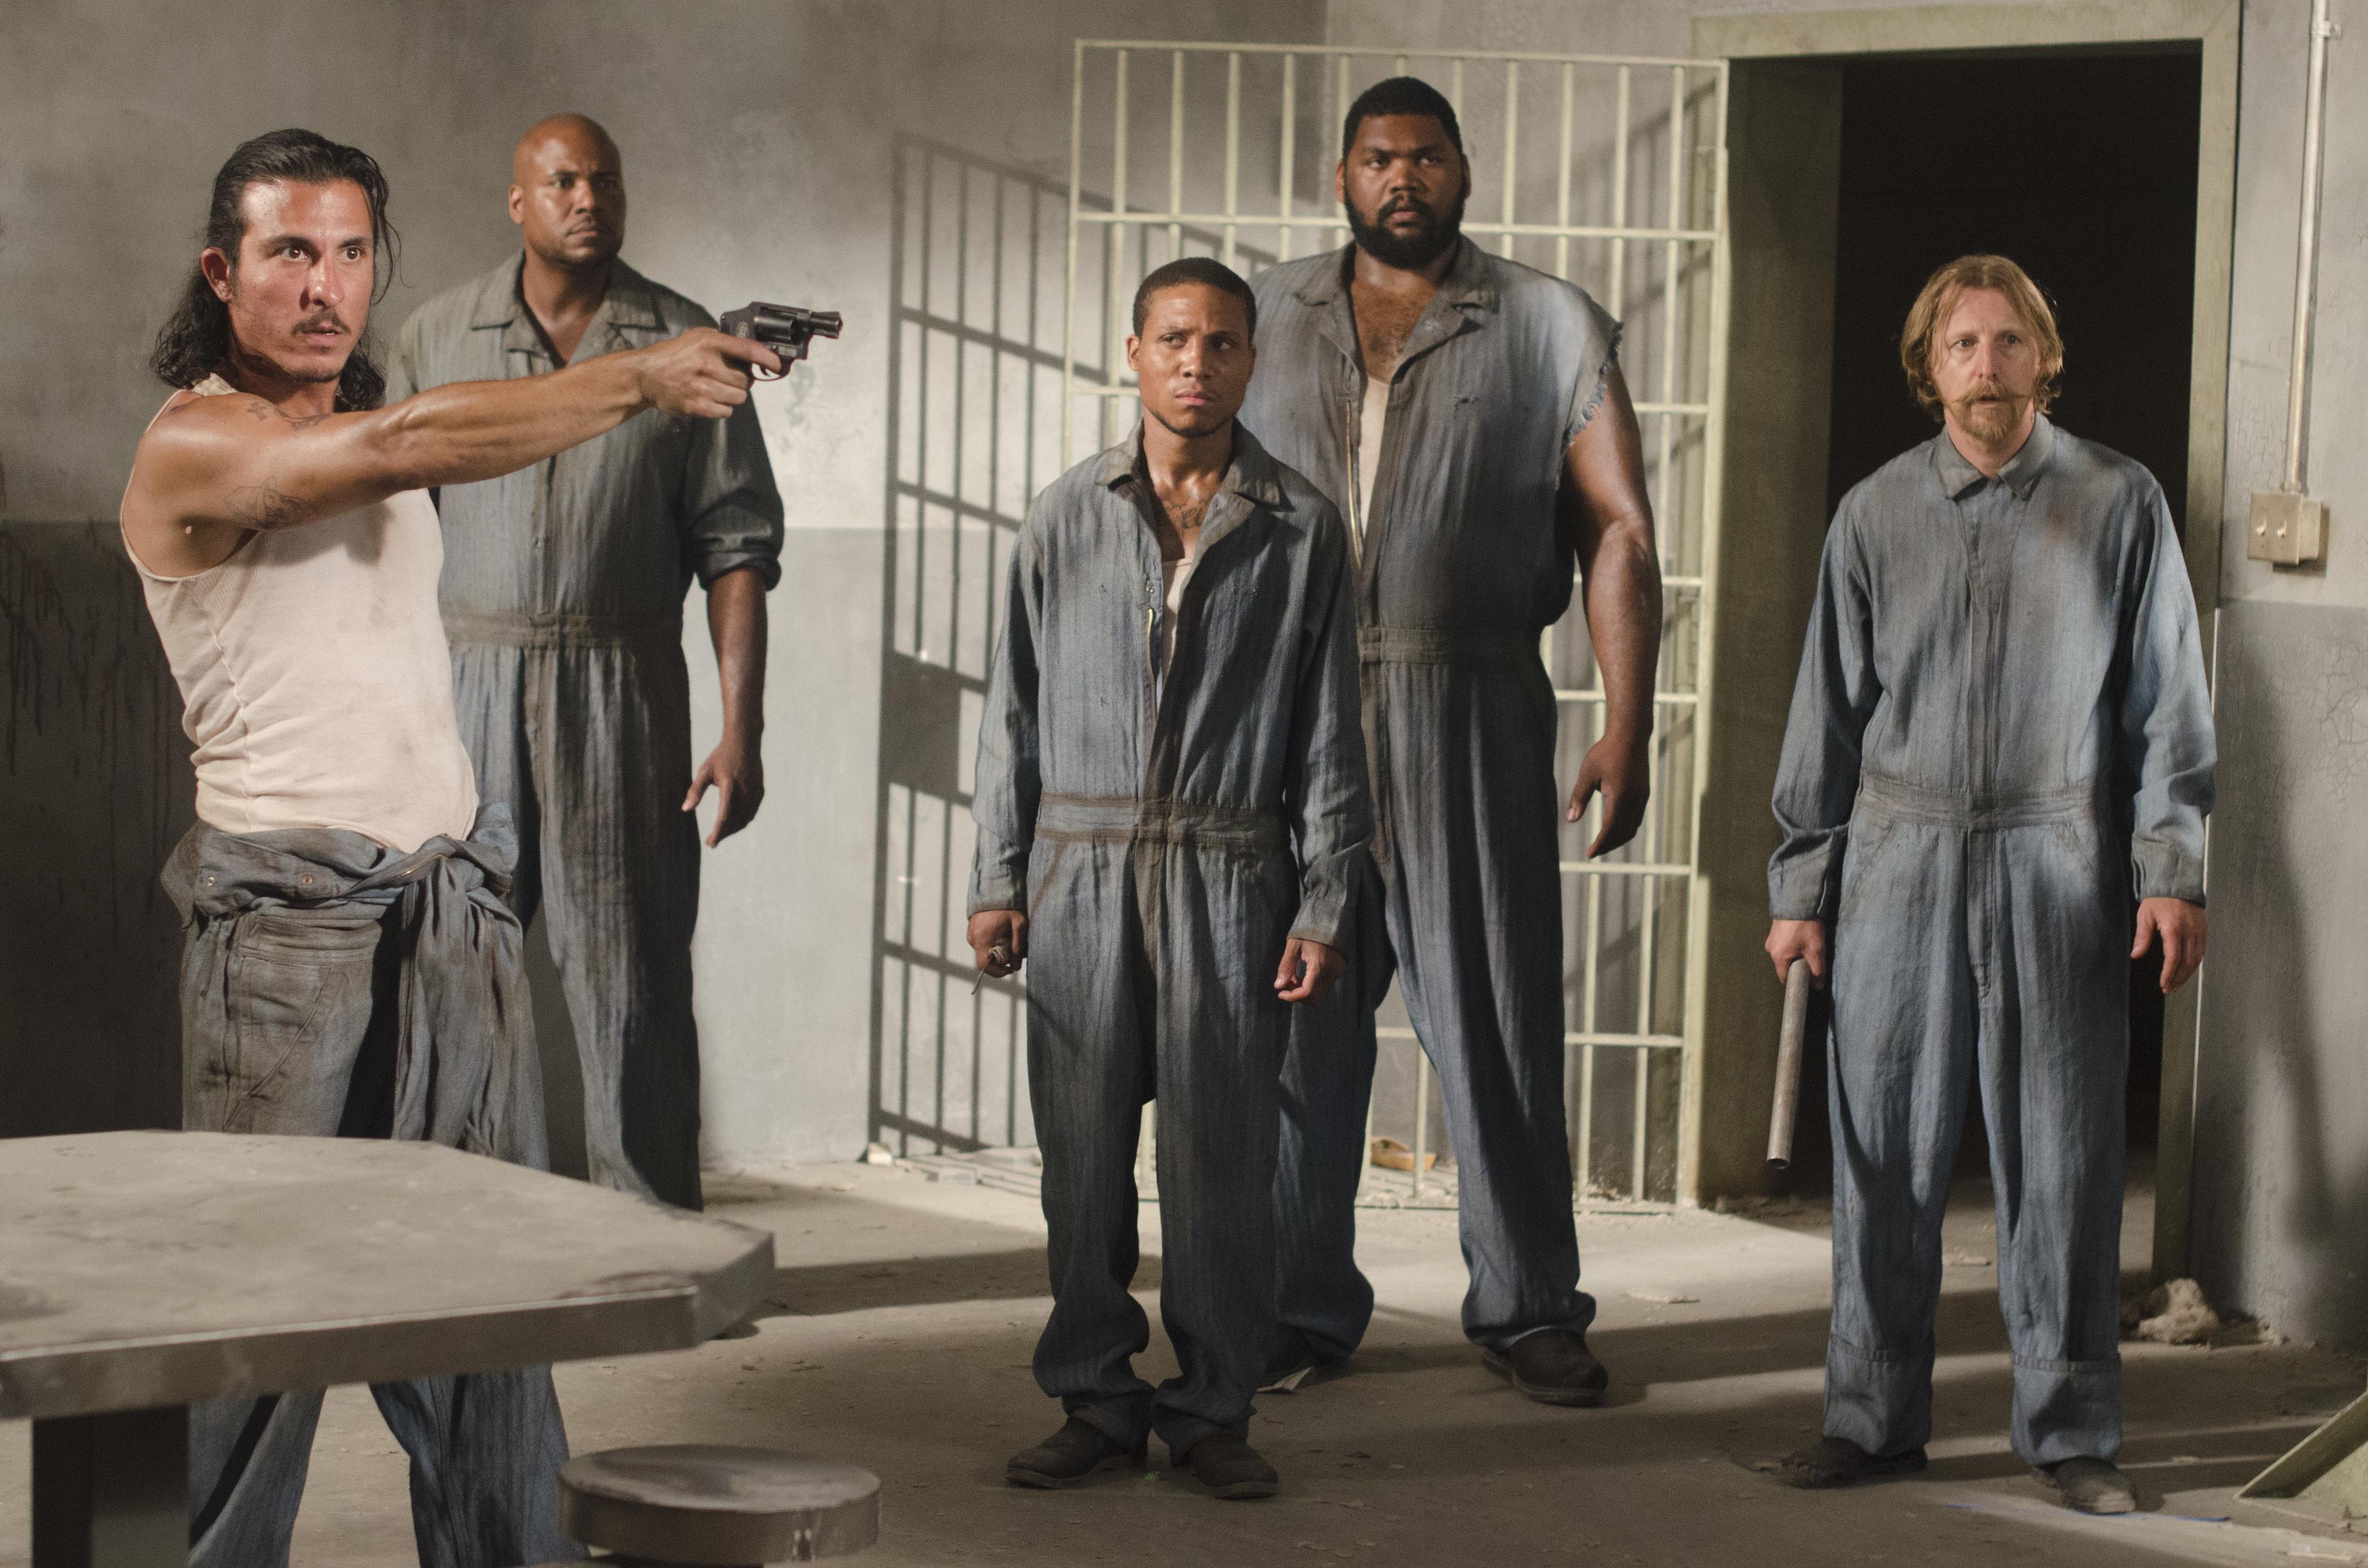 The Prisoners (TV Series)